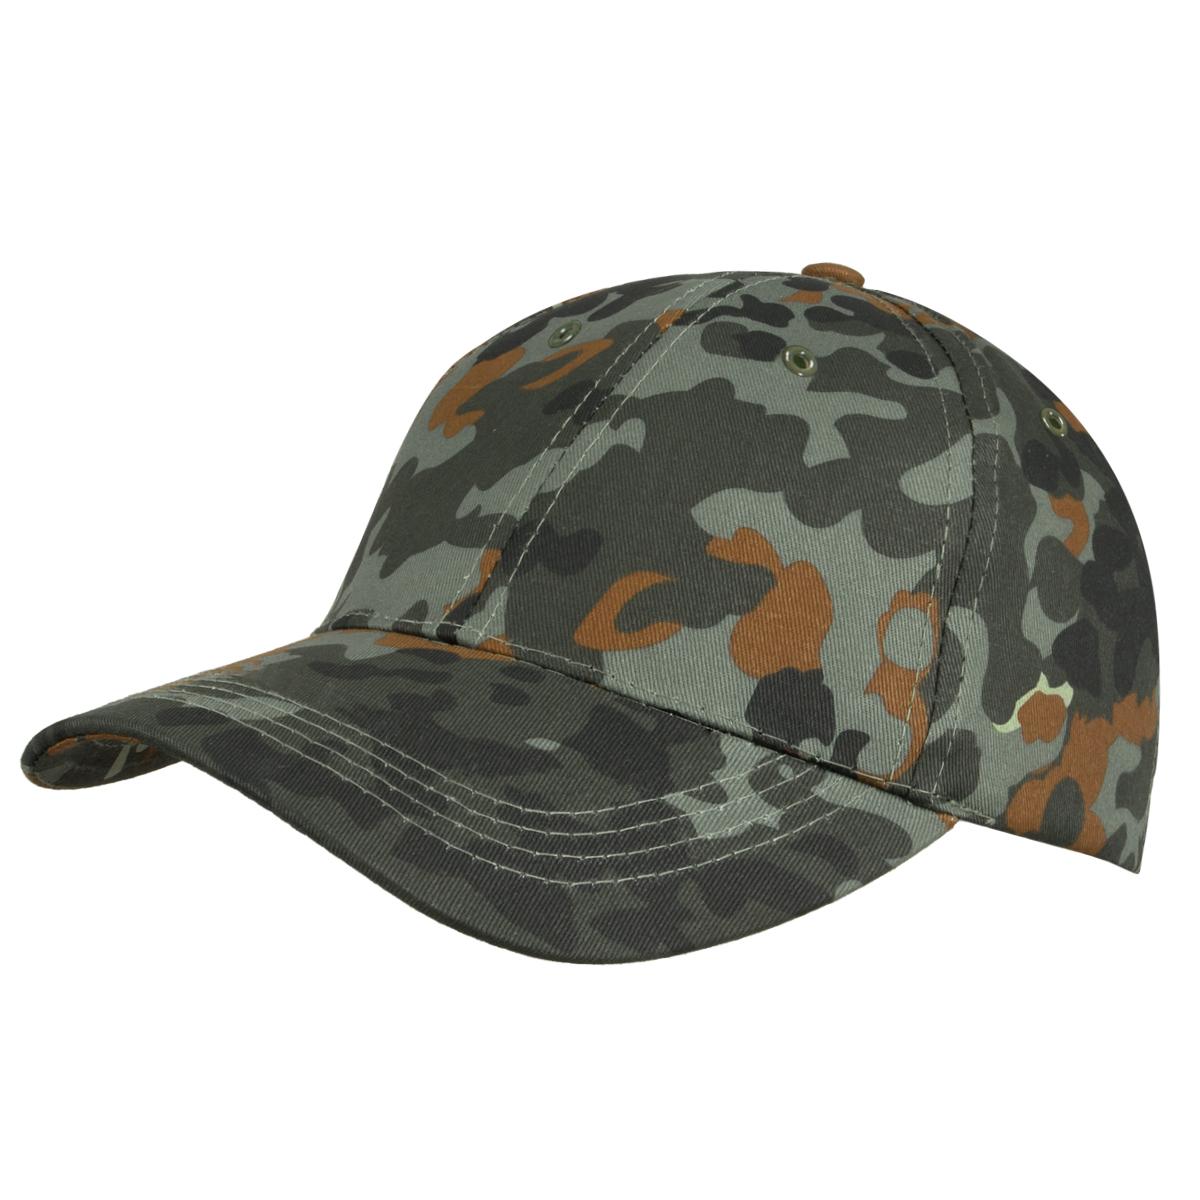 14200137 Details about KIDS ARMY MILITARY CADET BASEBALL CAP BOYS COMBAT HAT CAMPING  BW FLECKTARN CAMO